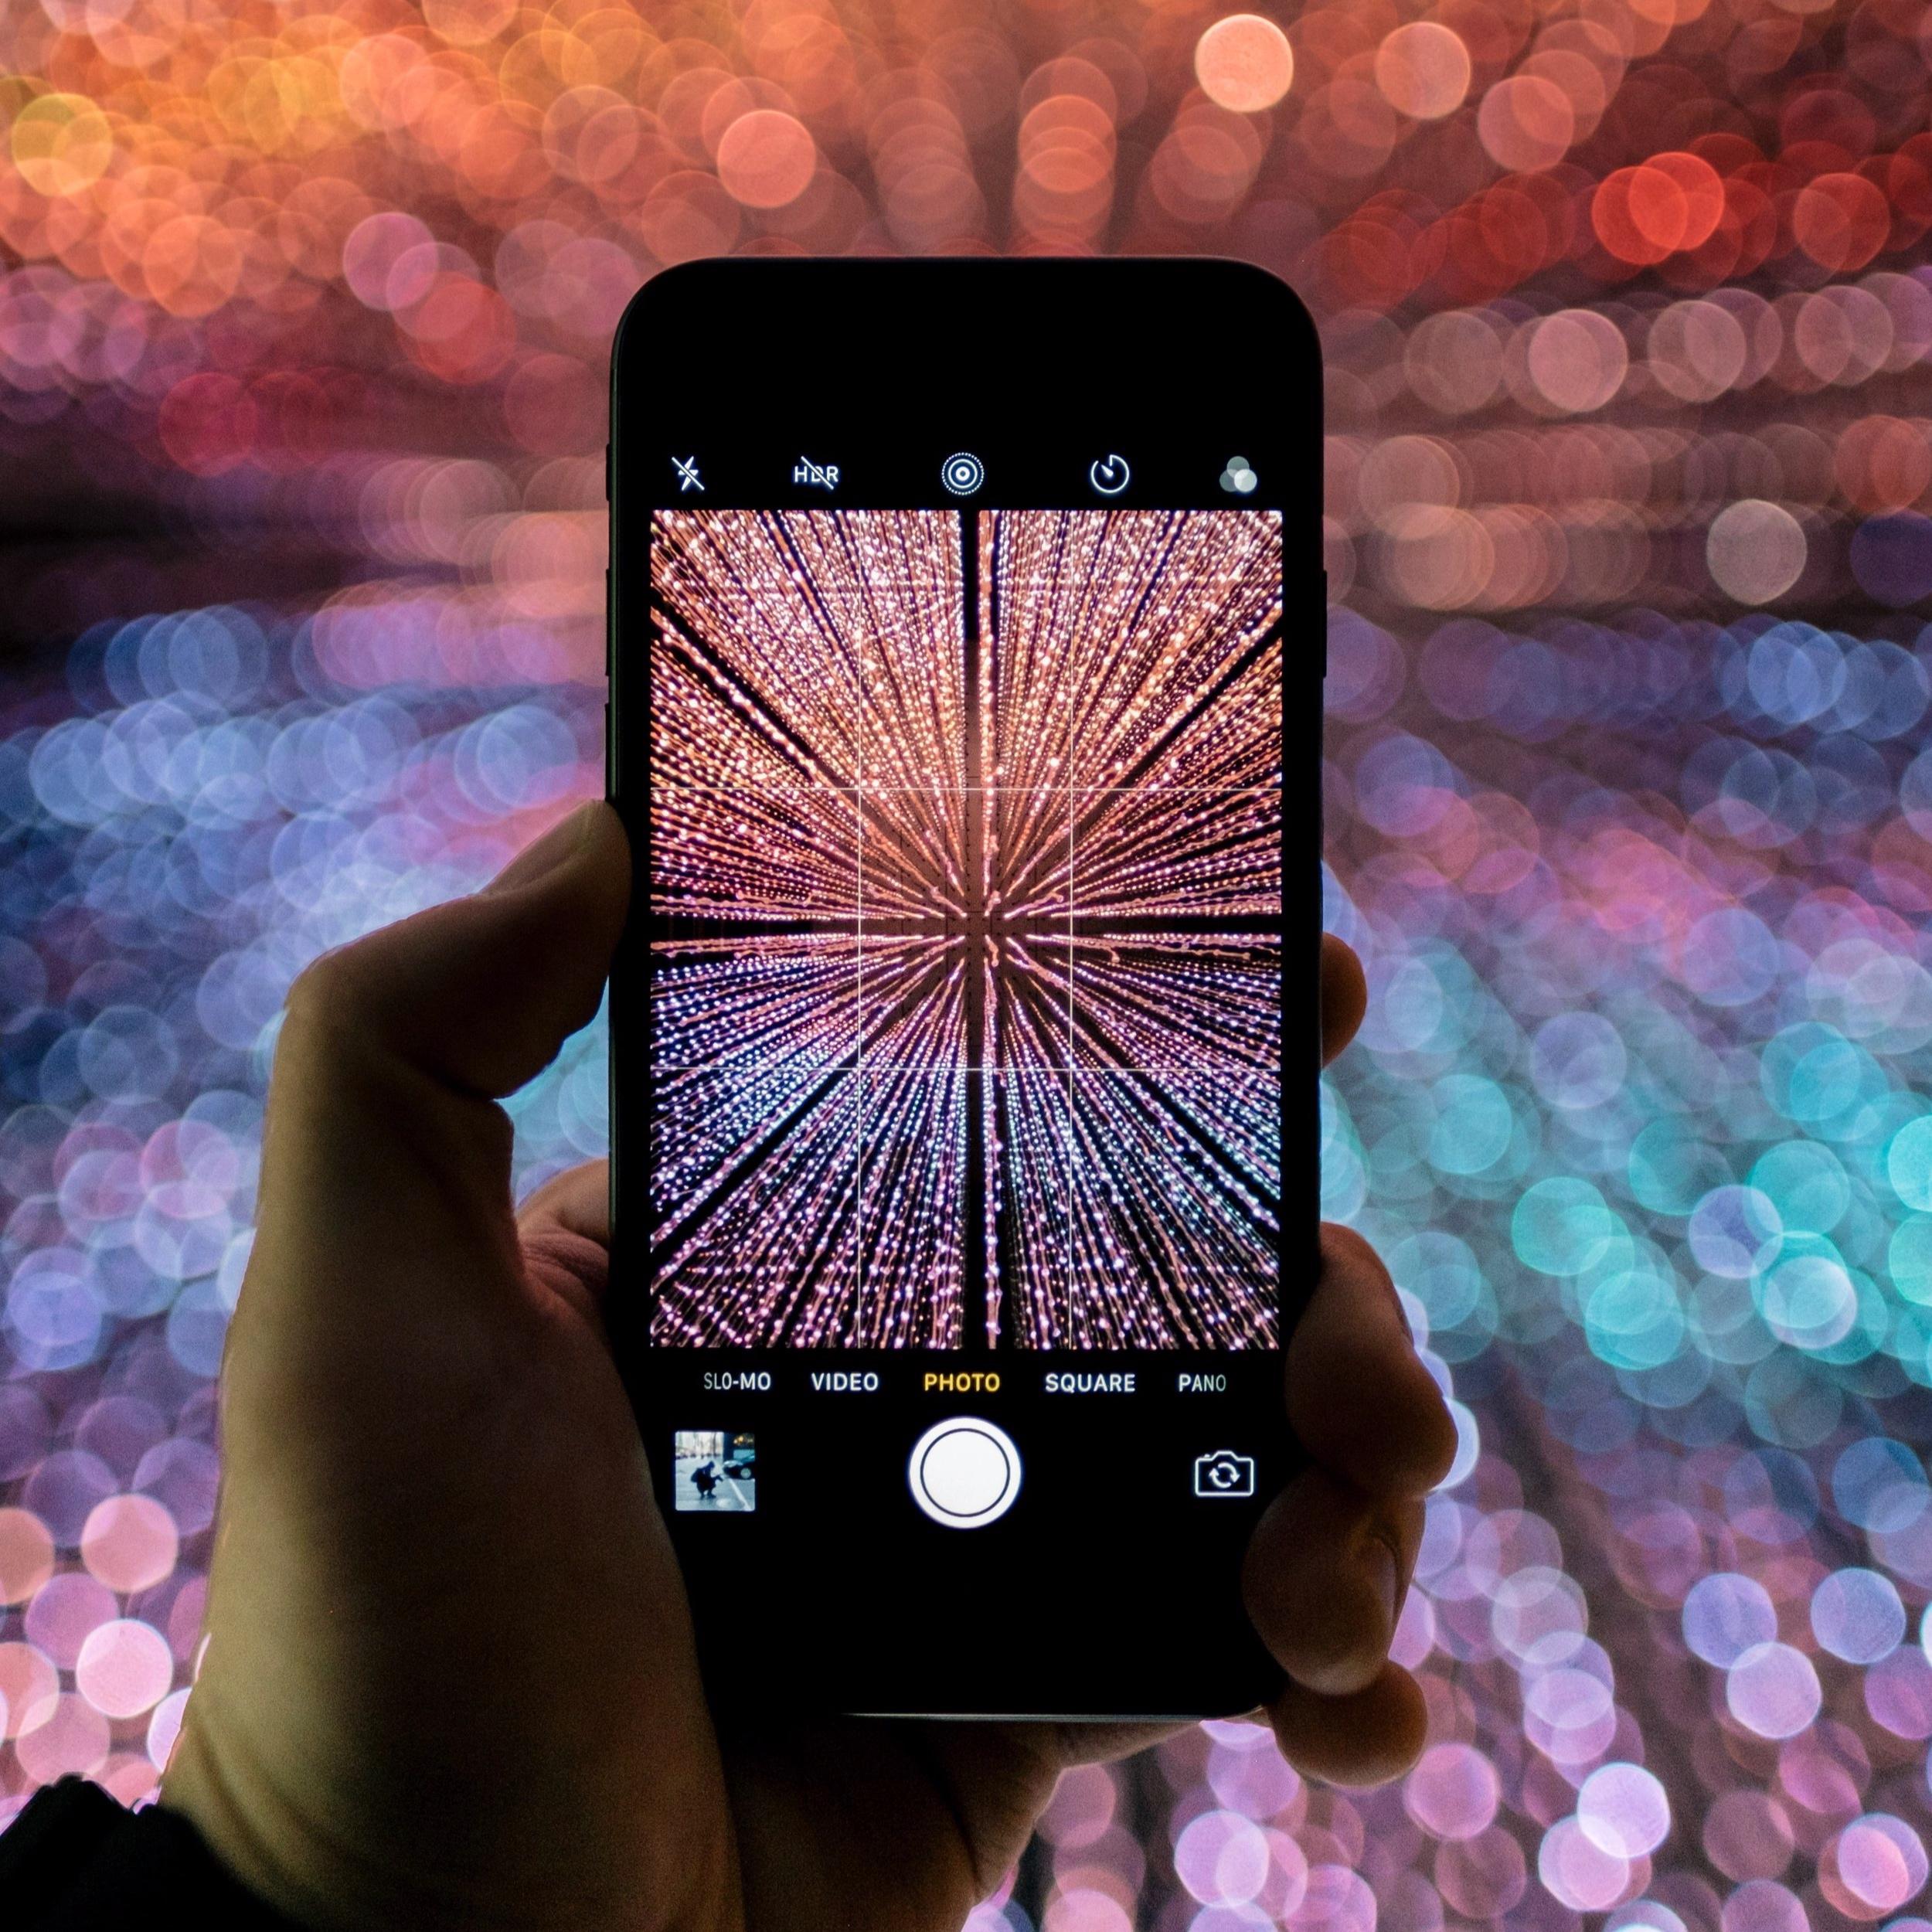 iphone-light-art-photography.jpg